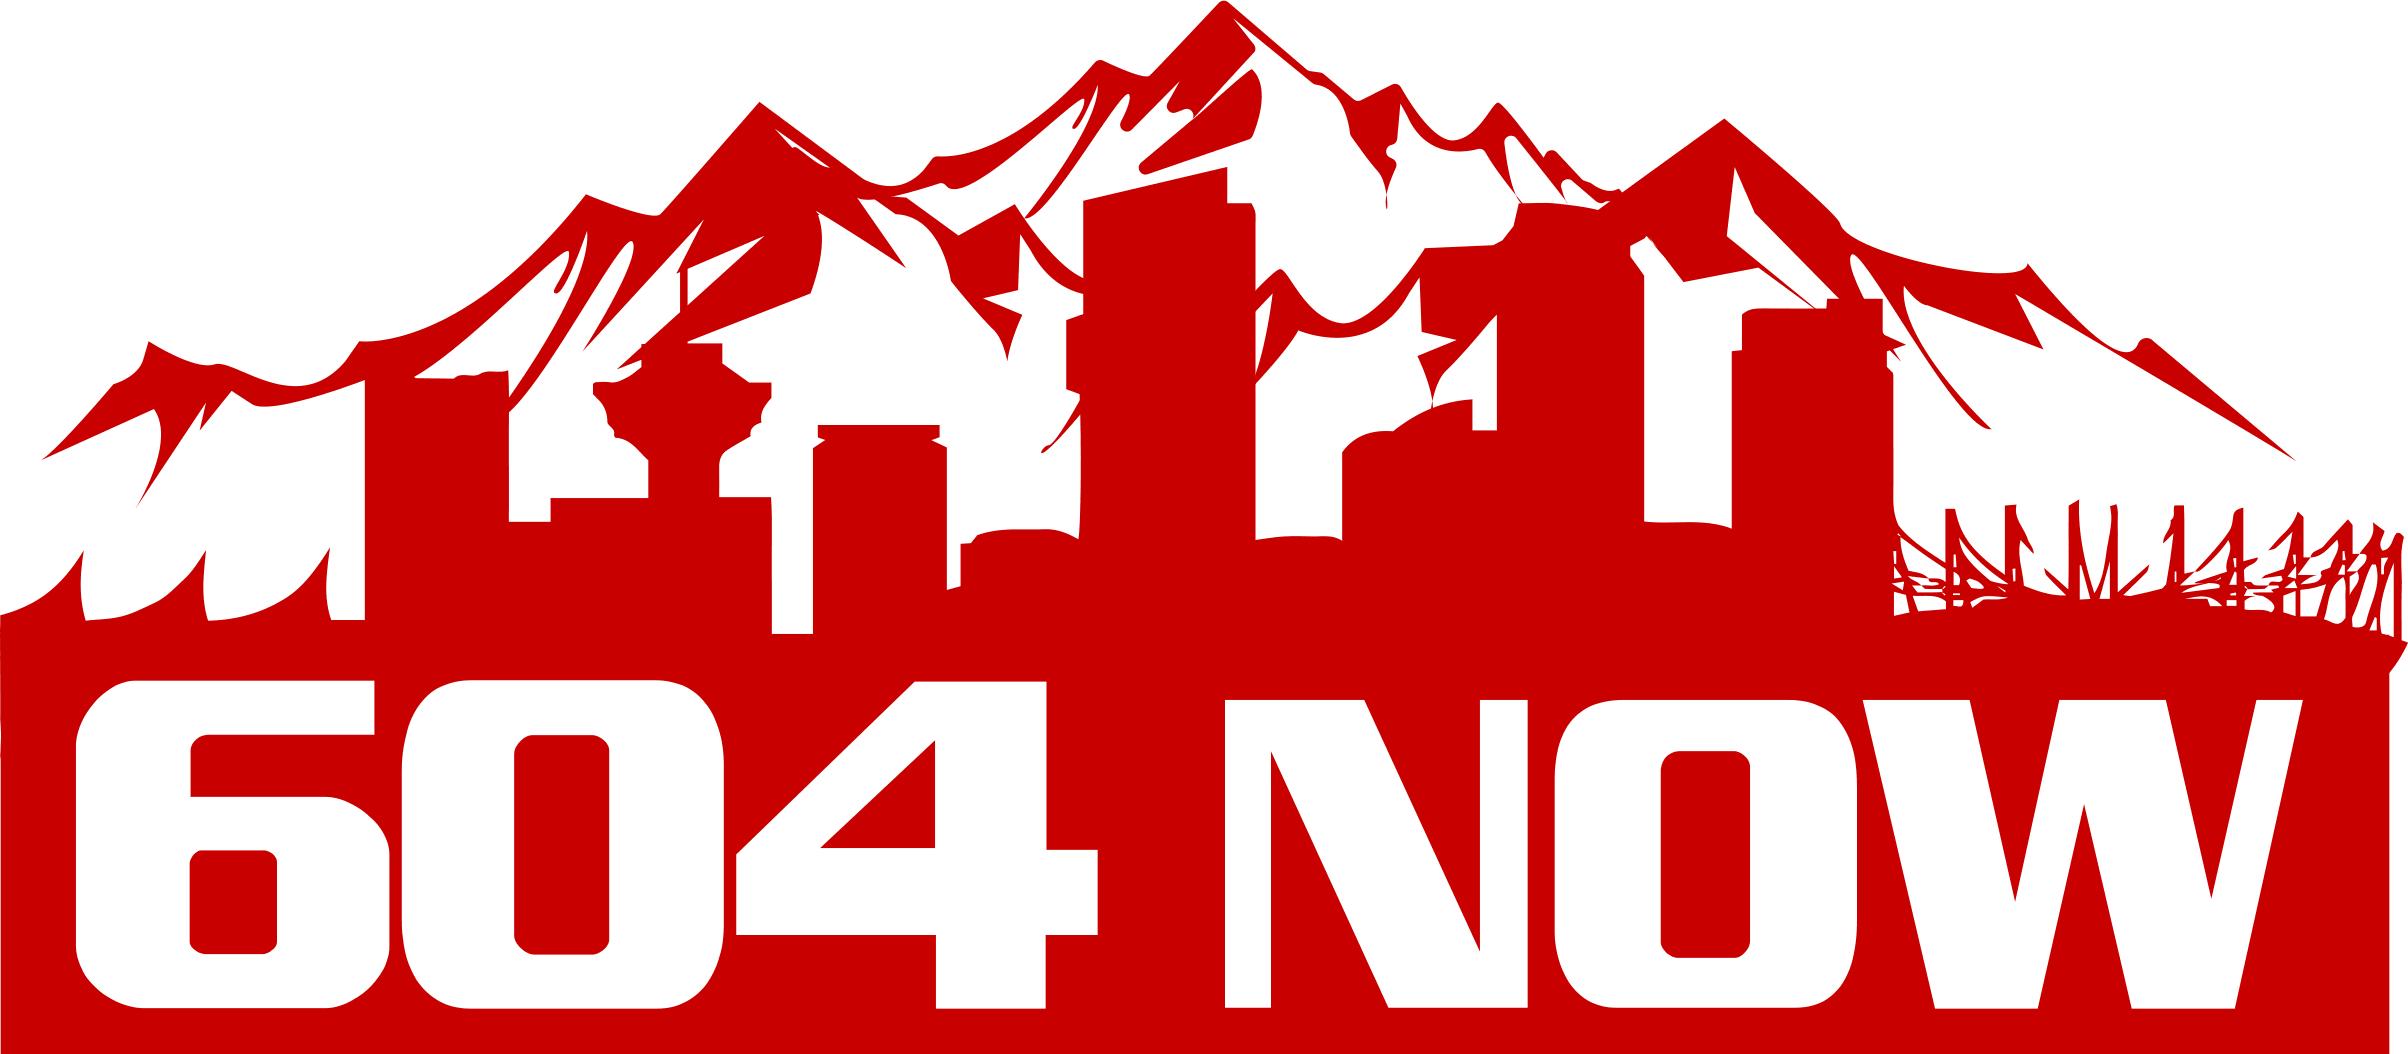 604now